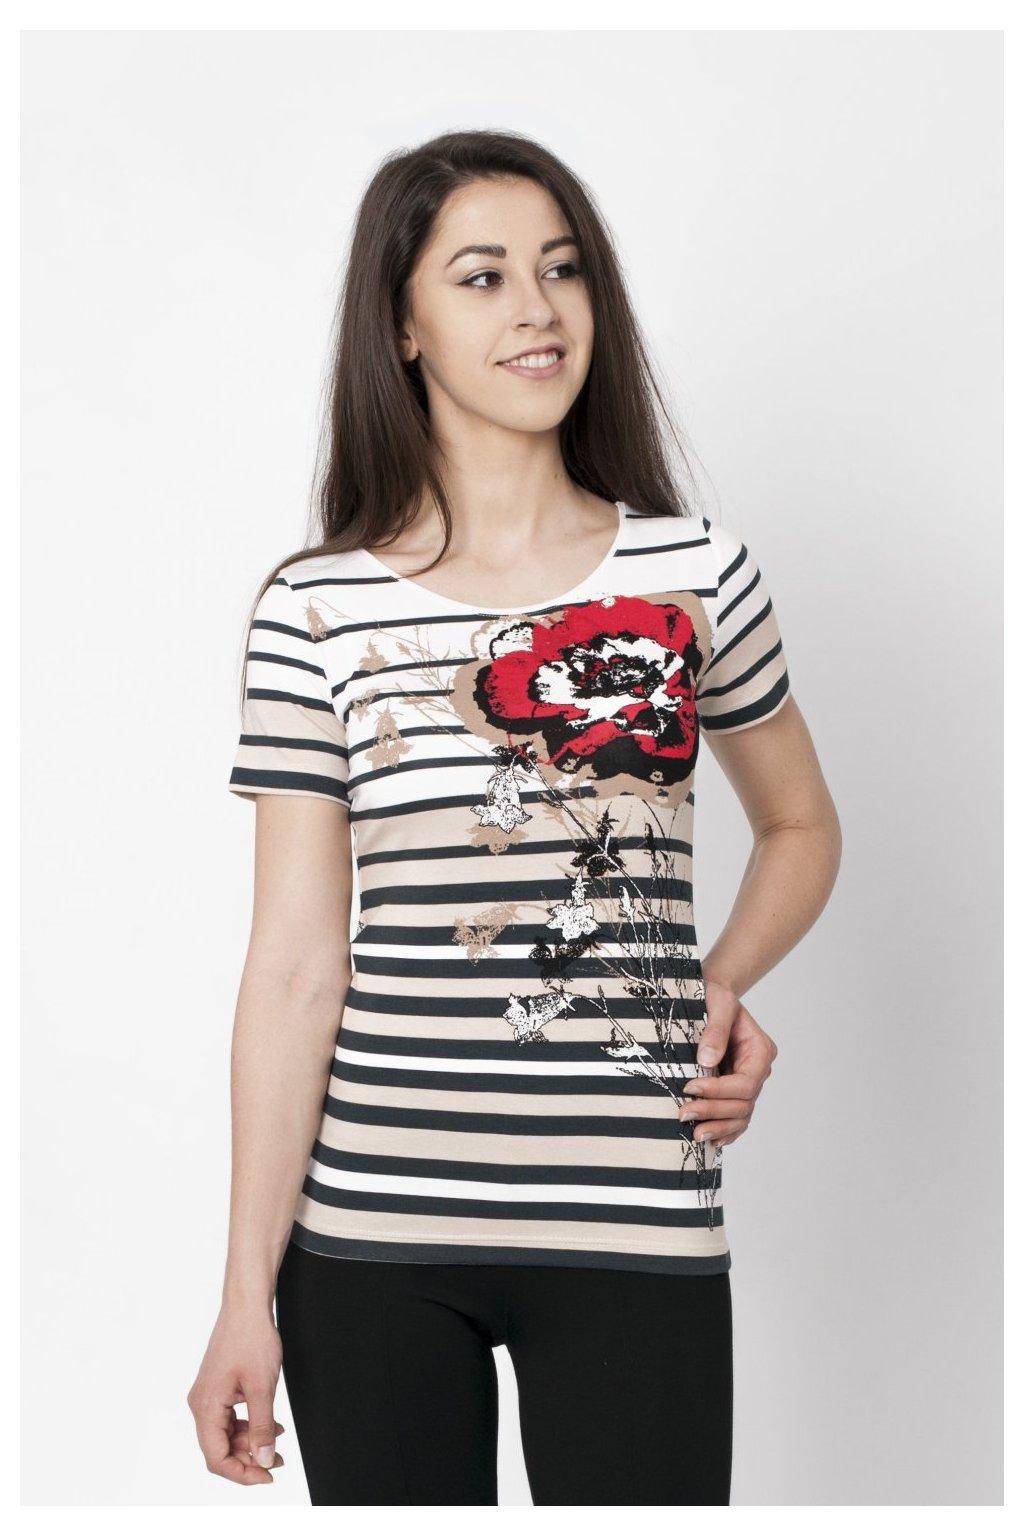 dámske tričko maky favab